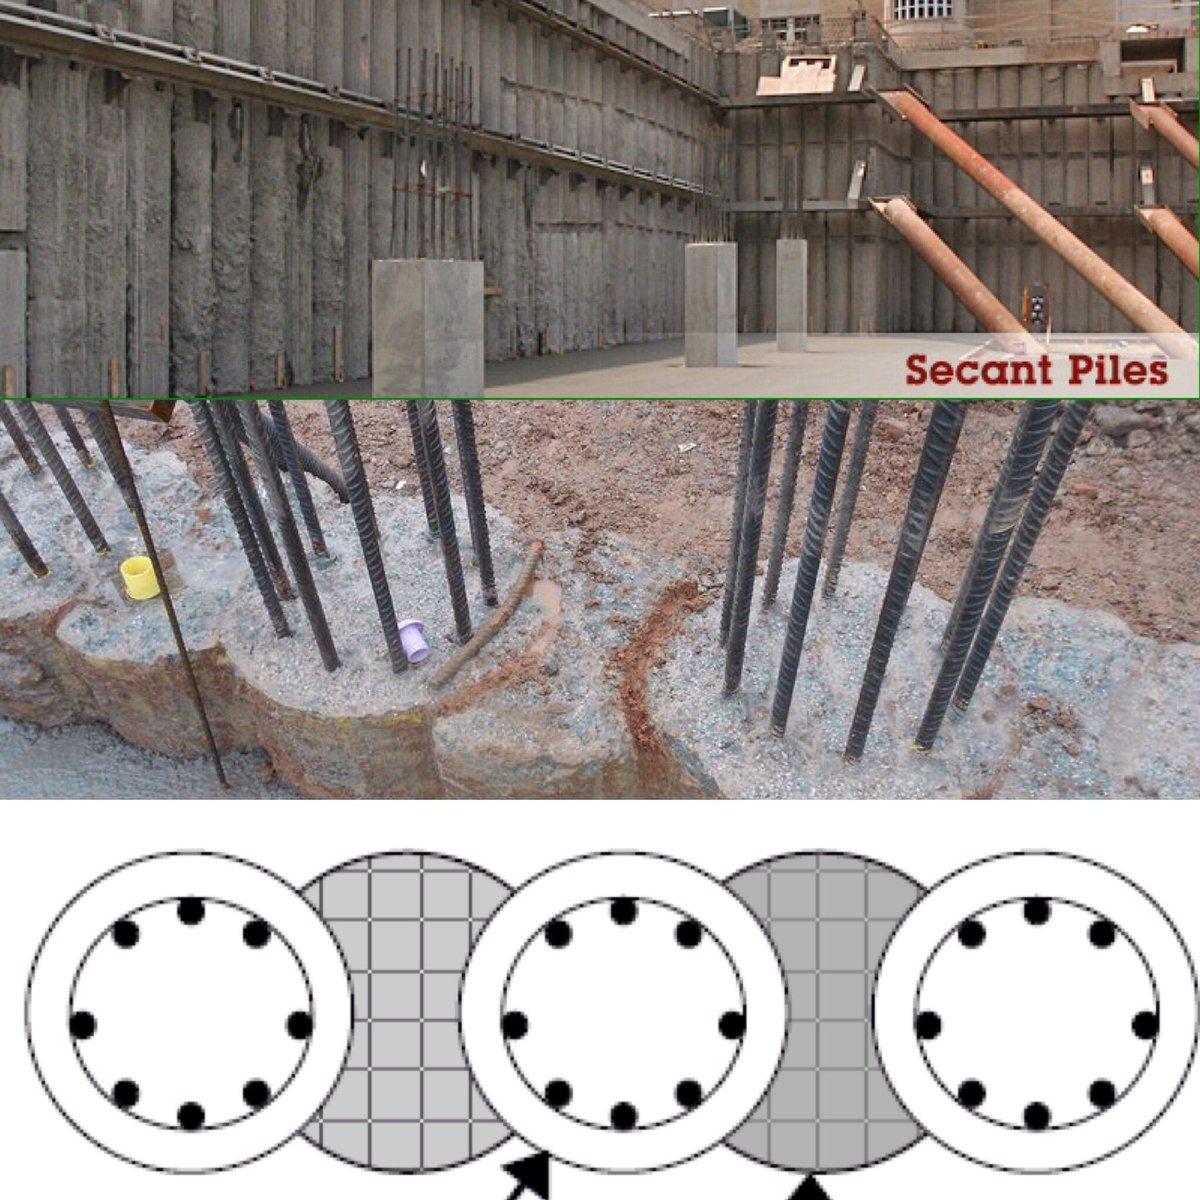 Muro mediante pilotes secantes